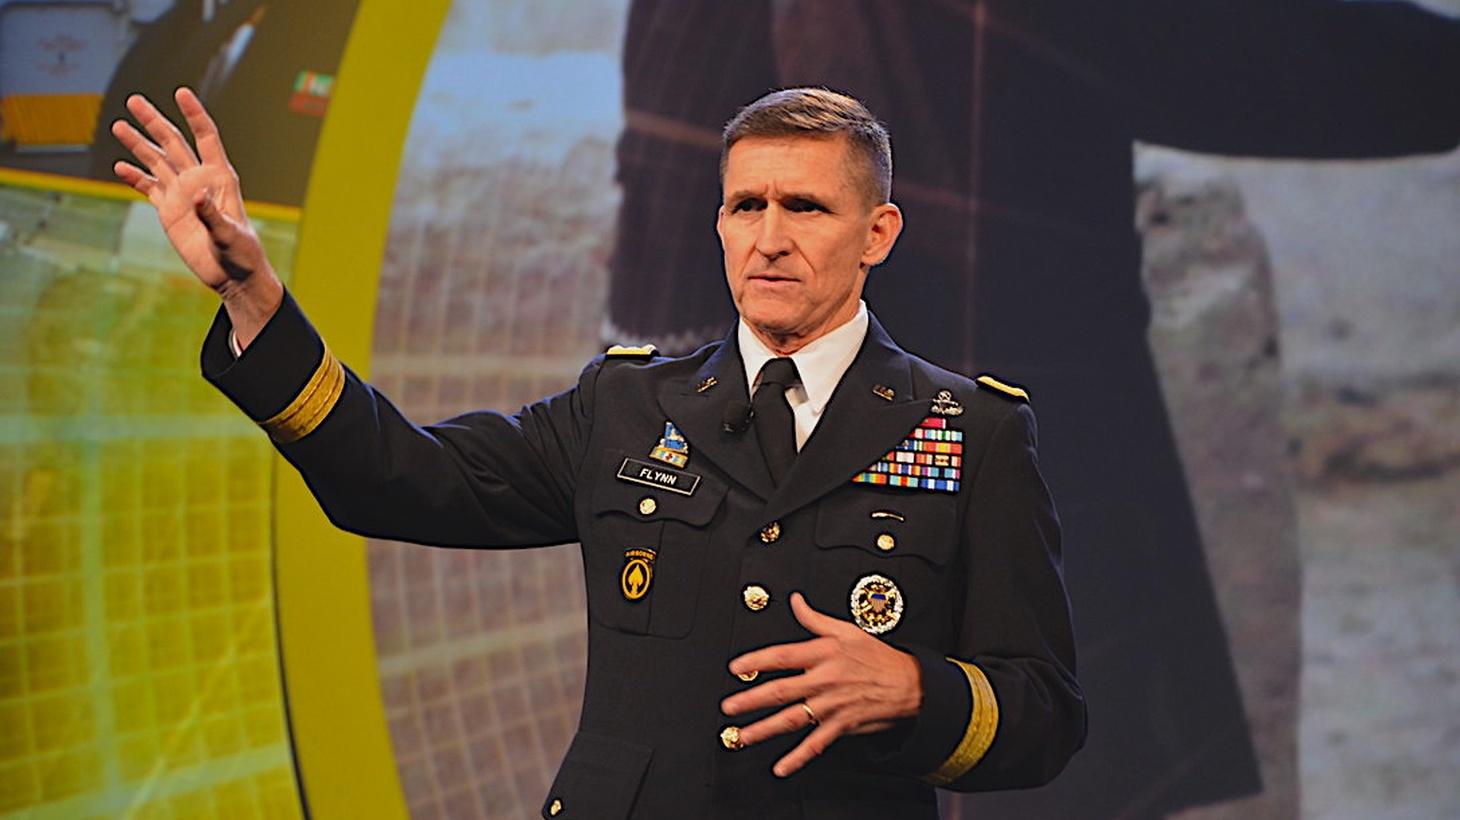 Former National Security Advisor Michael Flynn in 2012.